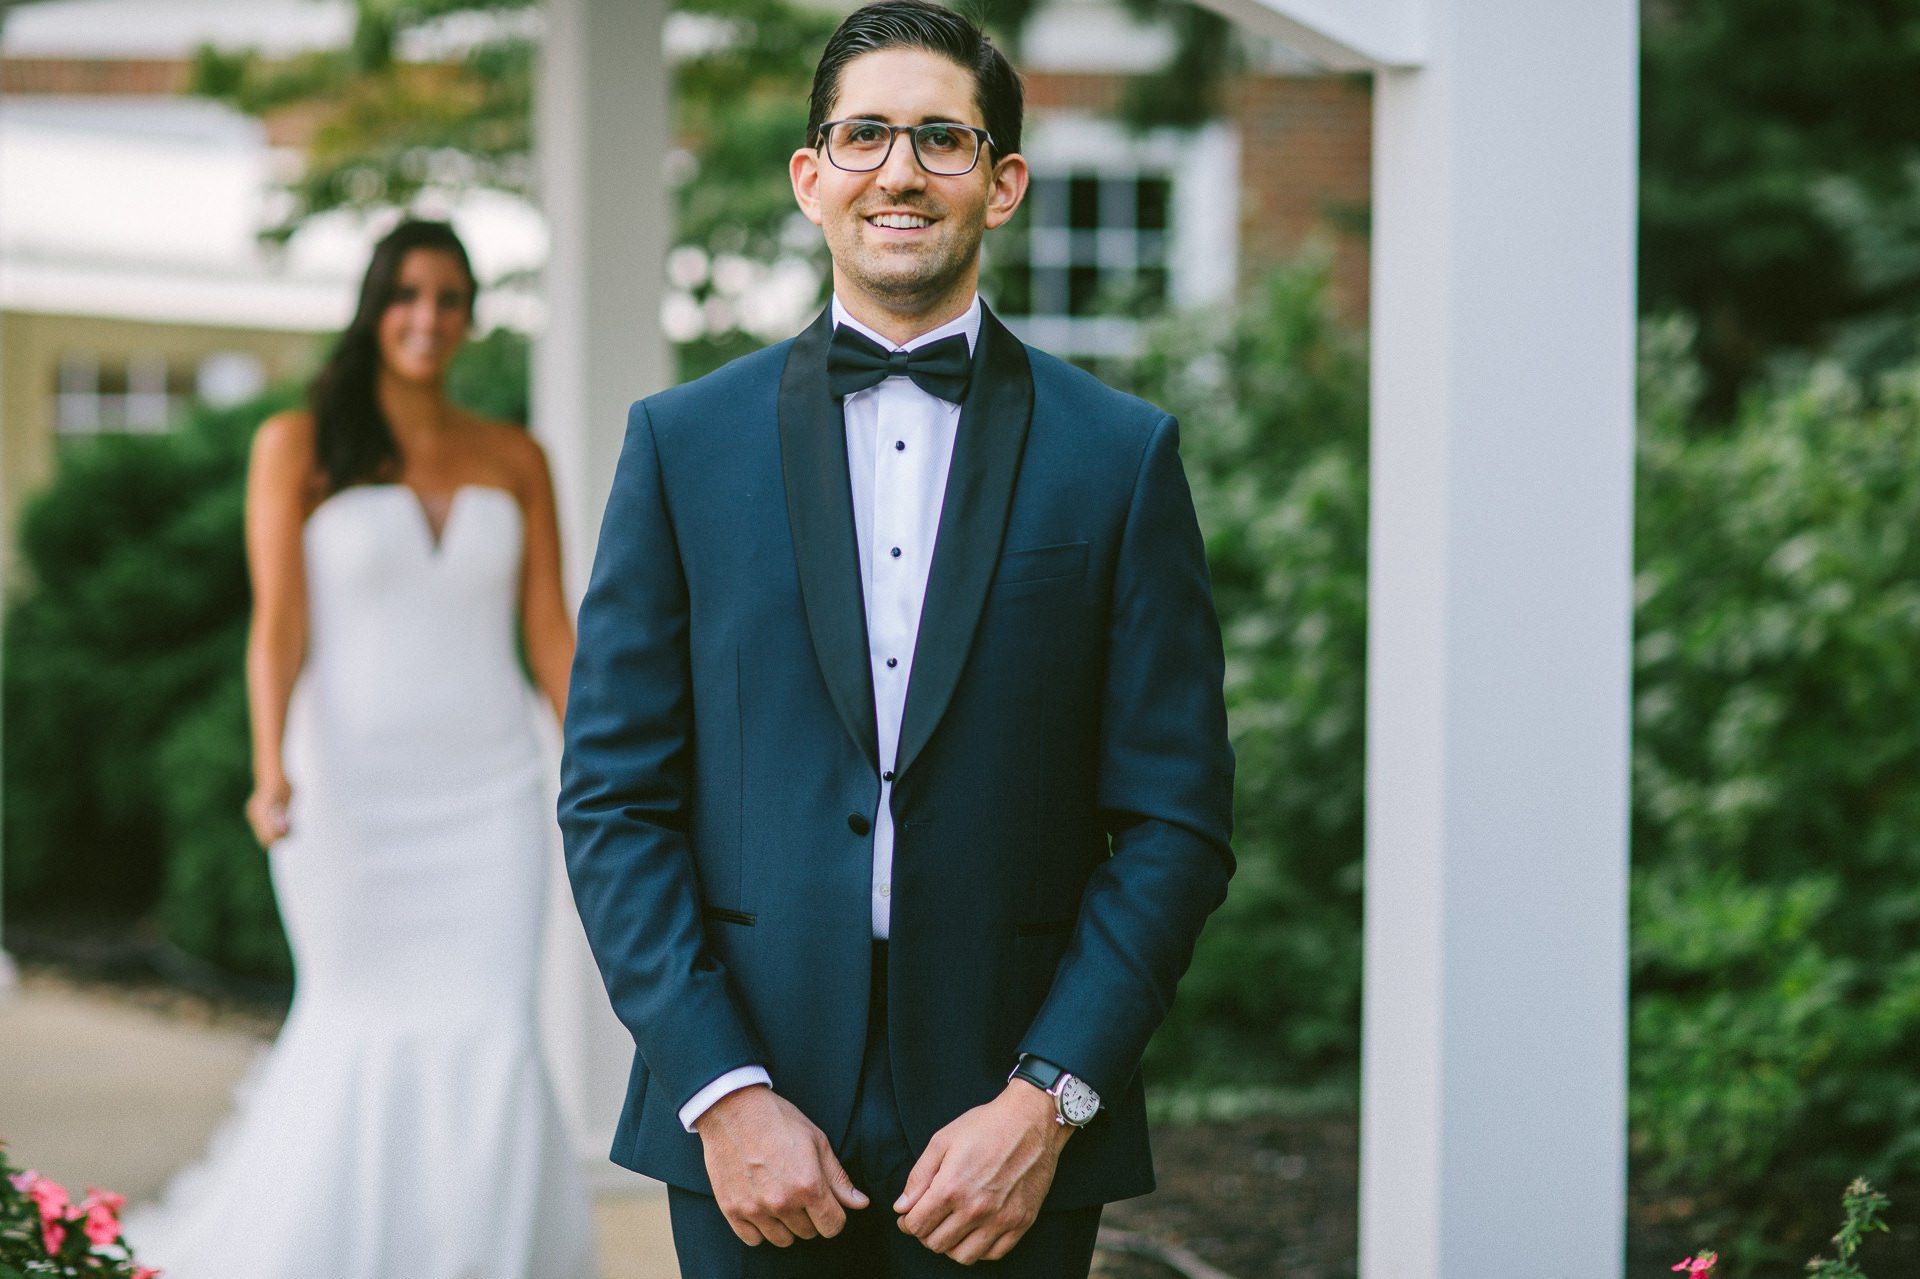 Beechmont Country Club Wedding Photographer in Beachwood 1 21.jpg